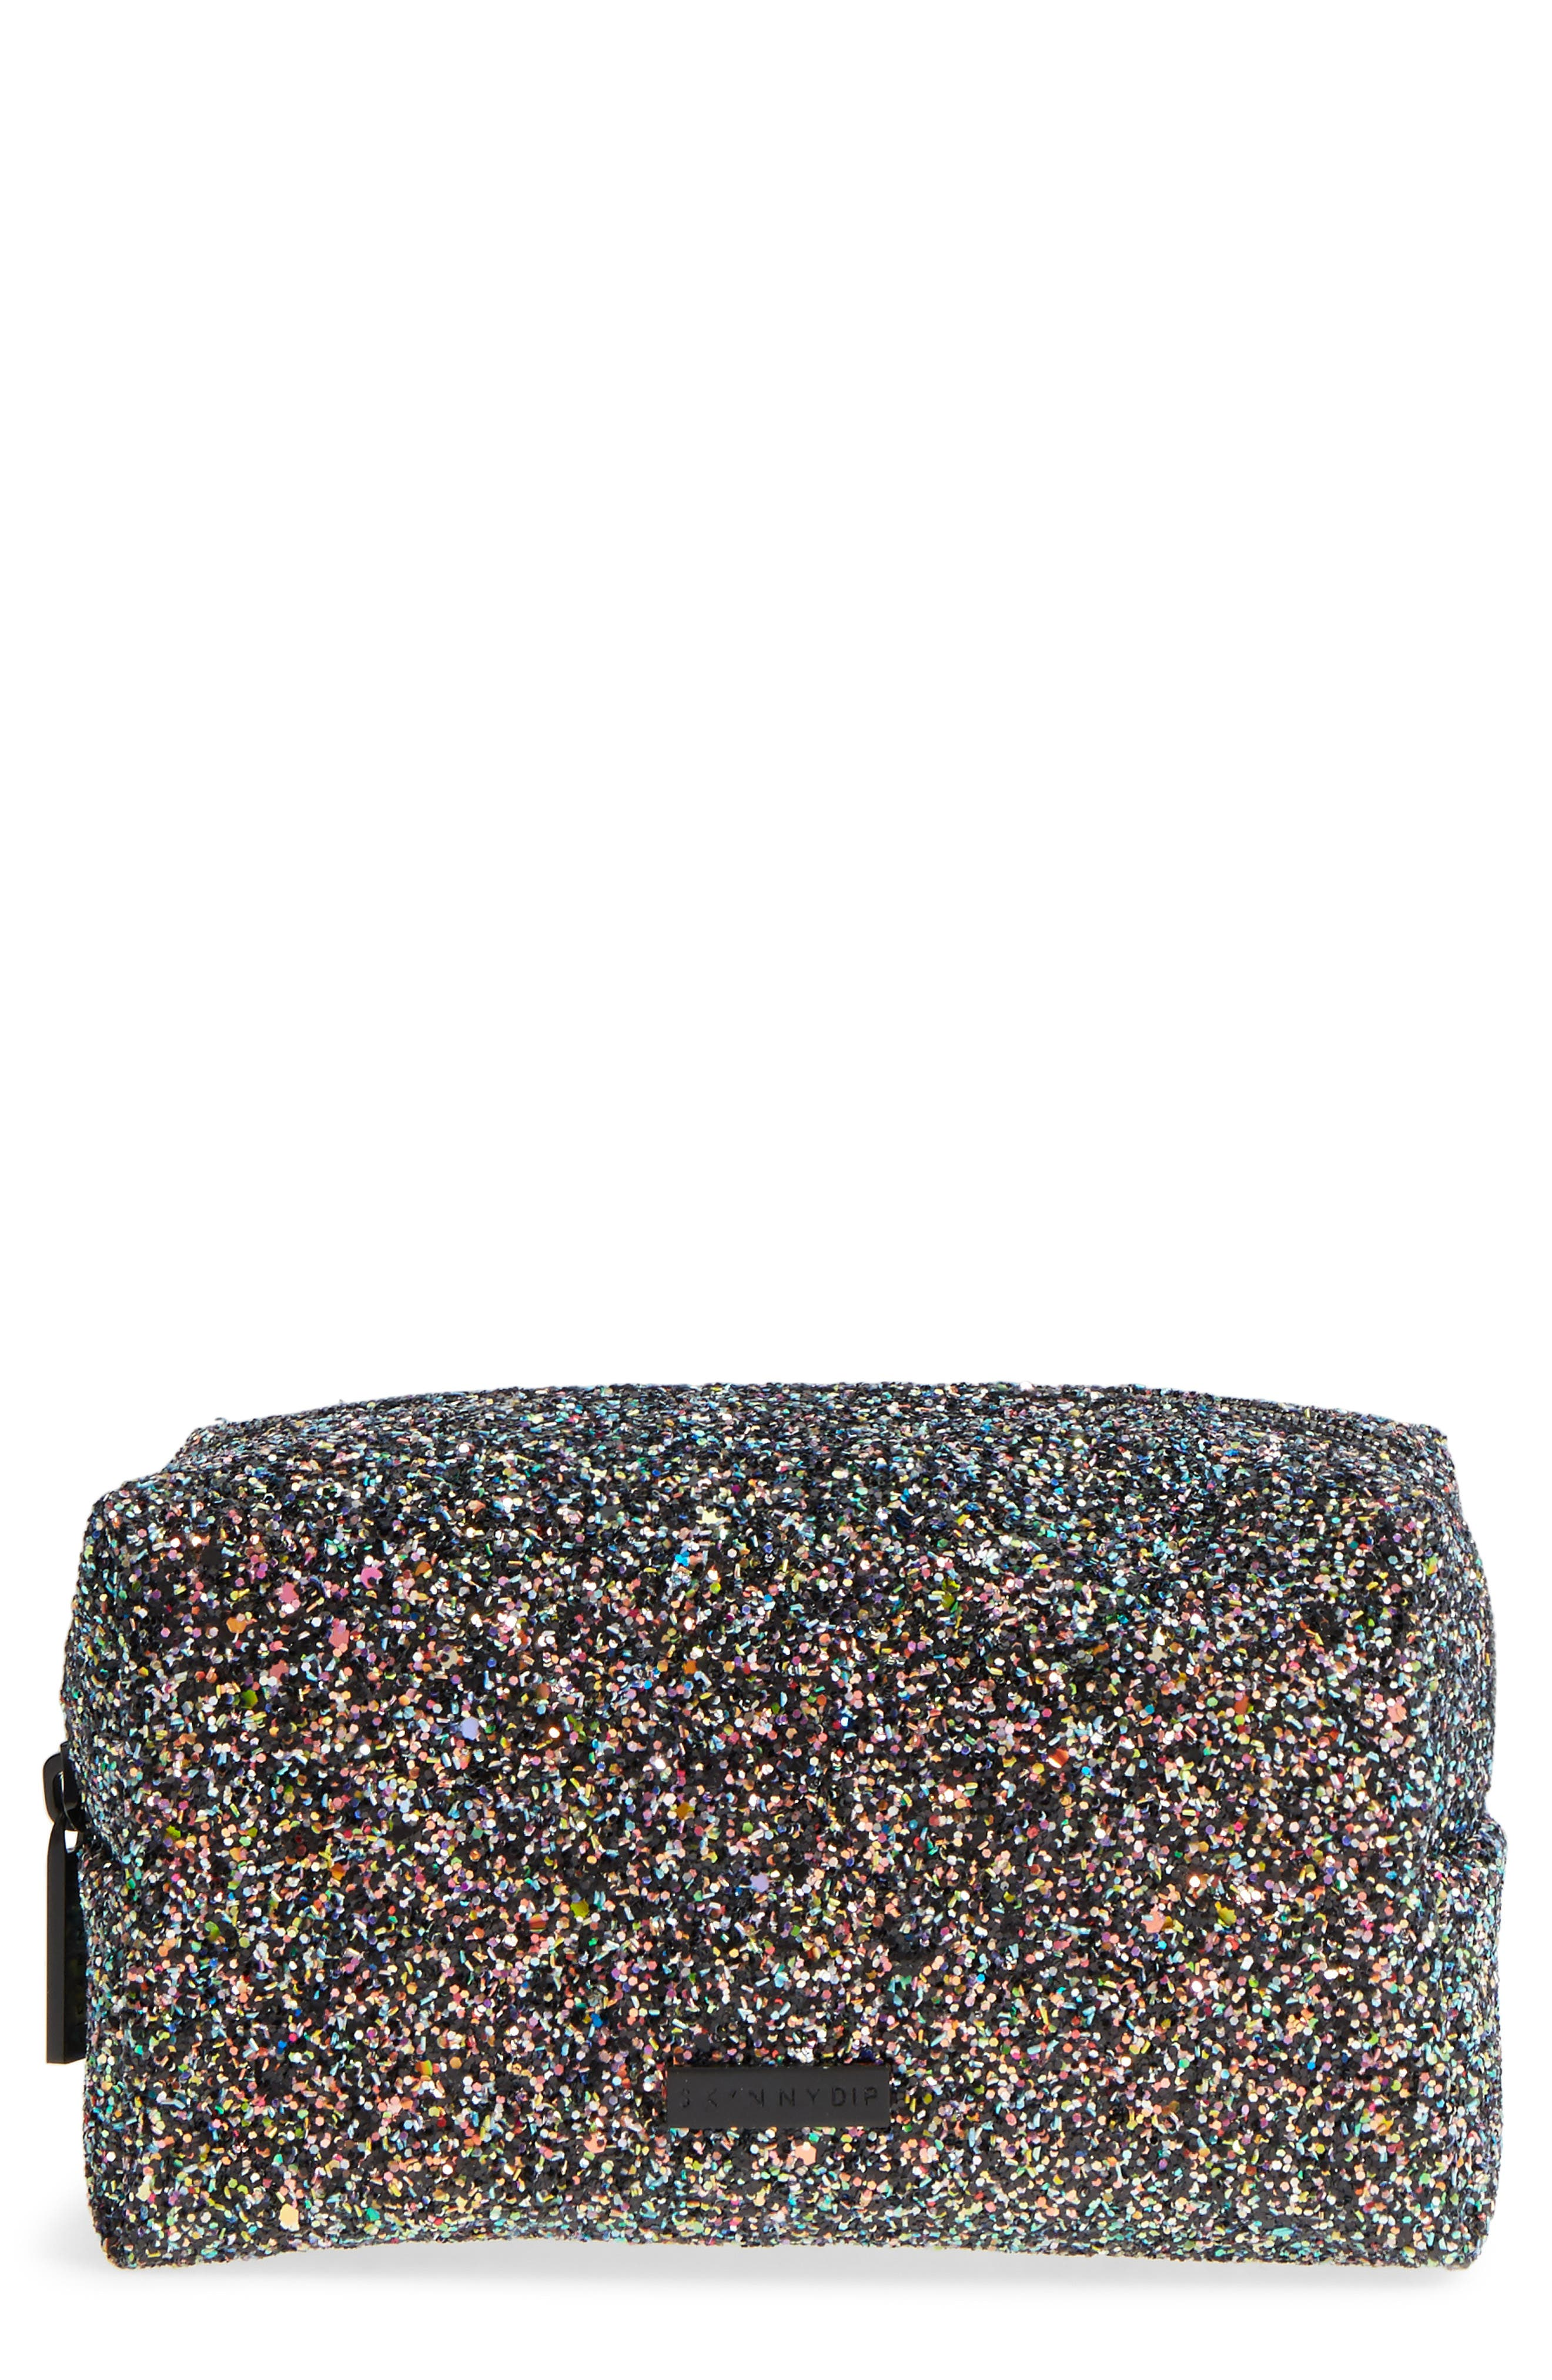 Skinny Dip Liquorice Glitter Cosmetics Bag,                             Main thumbnail 1, color,                             No Color